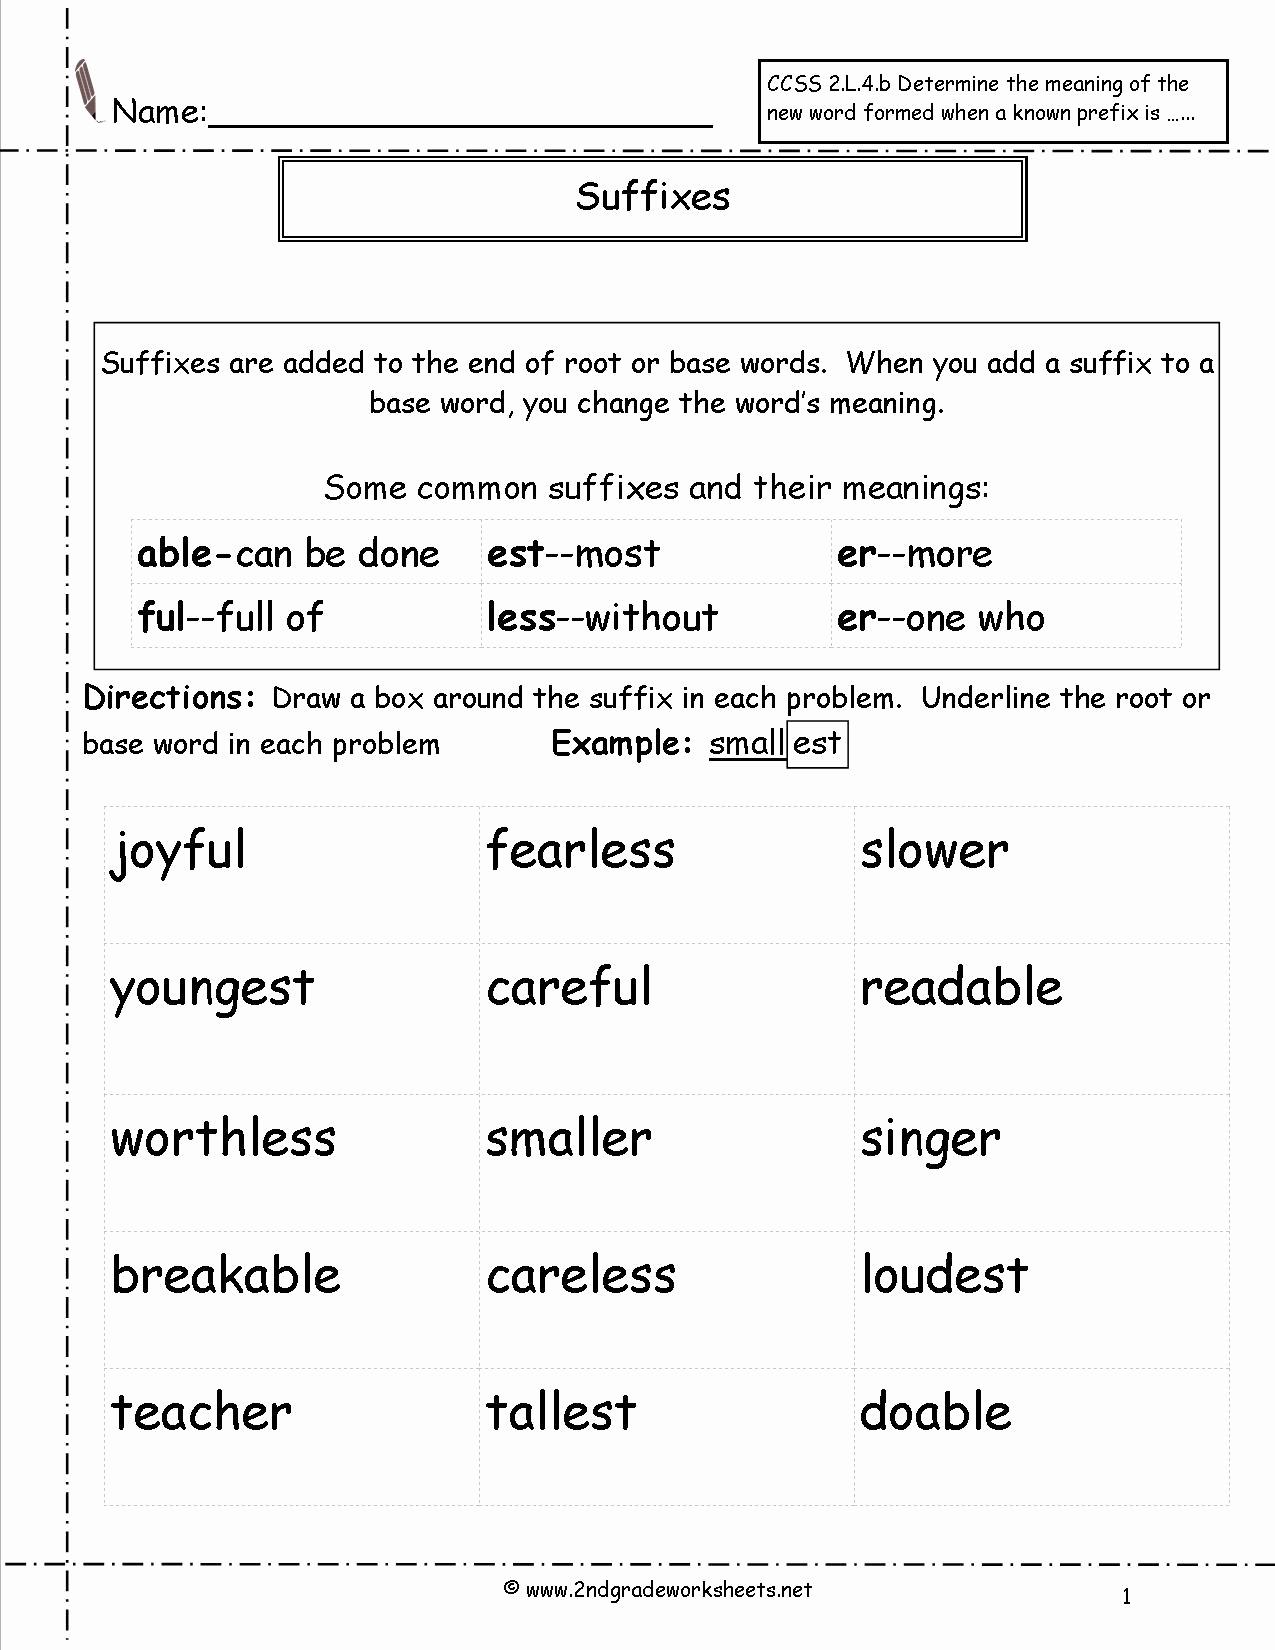 Free Suffix Worksheet Best Of Suffix 4 Driverlayer Search Engine